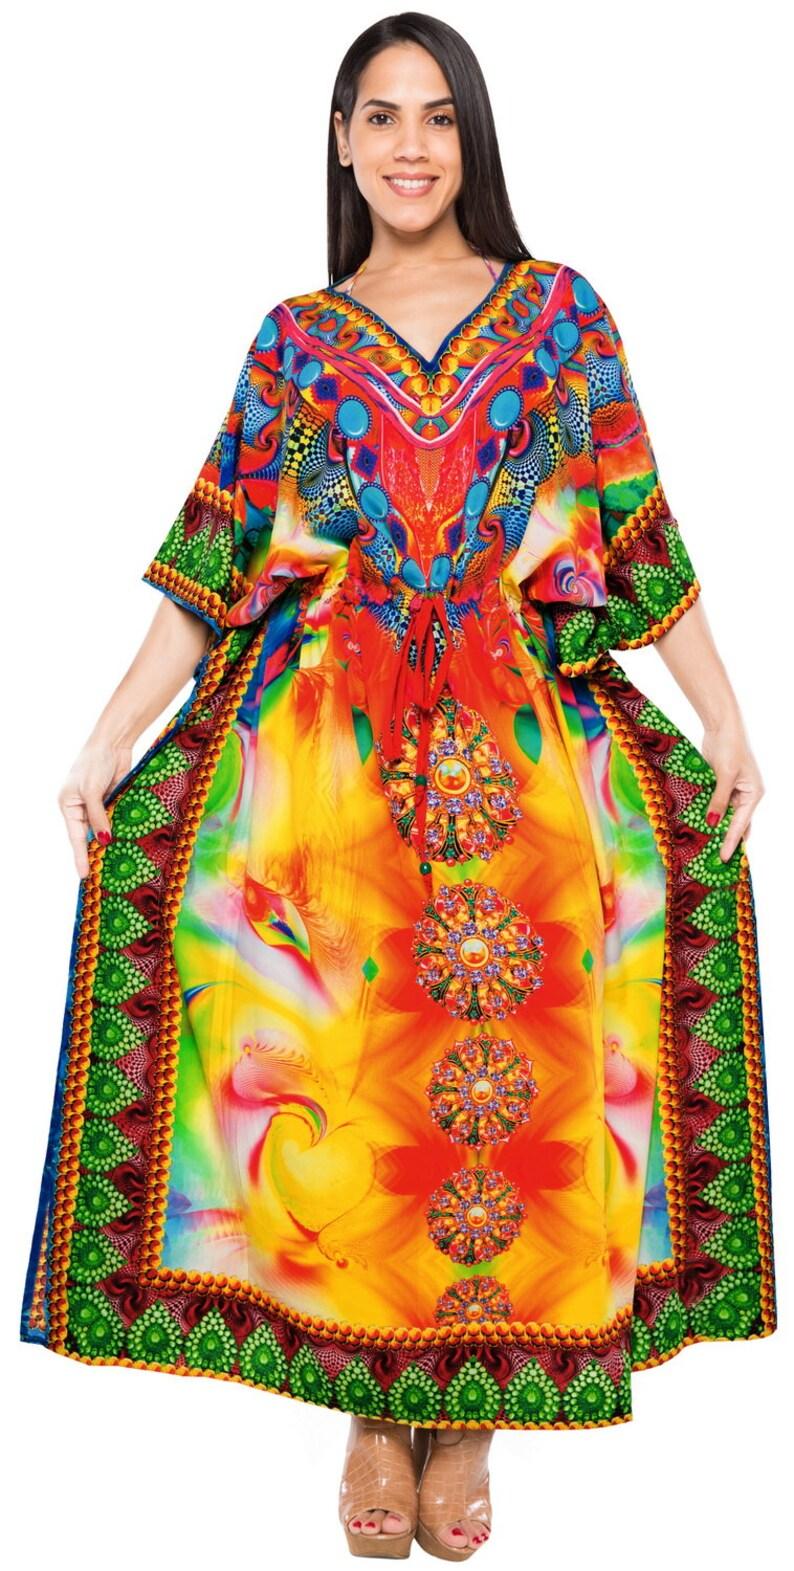 2c0785744f LA LEELA Women's Nightgown Caftan Plus Size HD Designer Drawstring Dress  L-4X Plus Size Lounge Wear - 134683